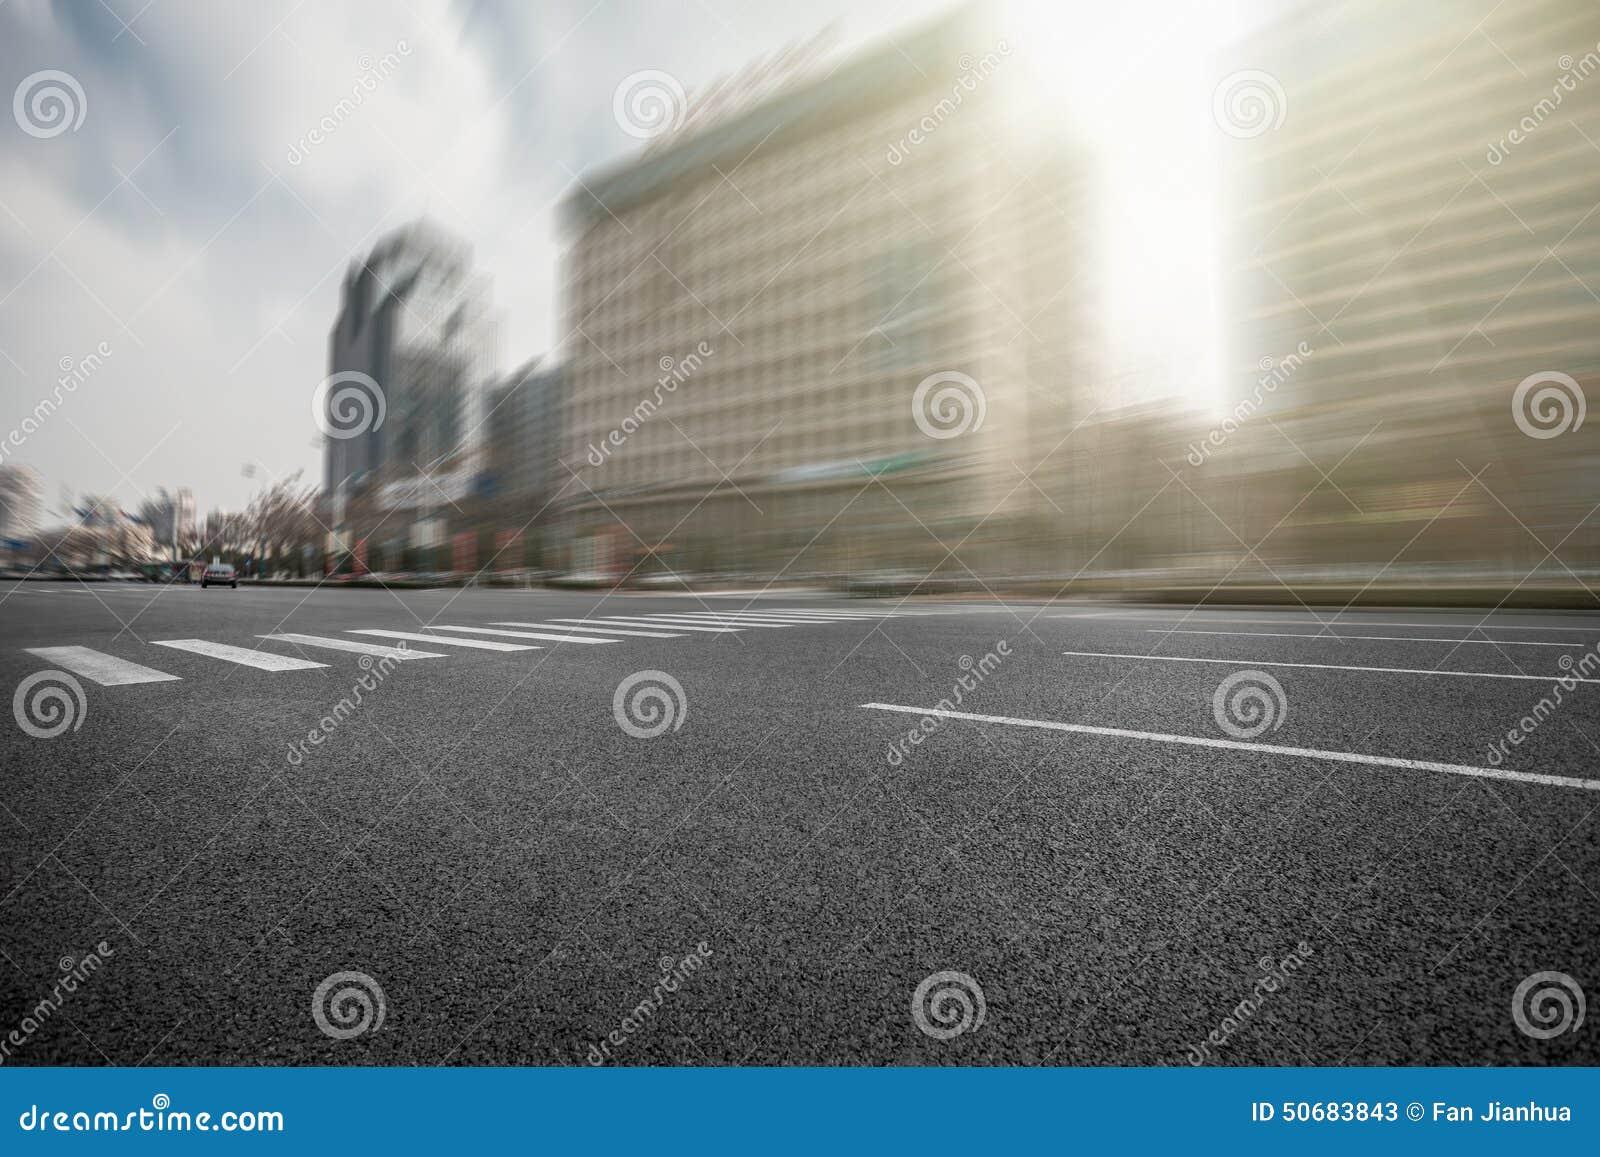 Download 现代建筑学背景和路 库存图片. 图片 包括有 方向, 都市, 室外, 发展, 业务量, 现代, 汽车, 转接 - 50683843